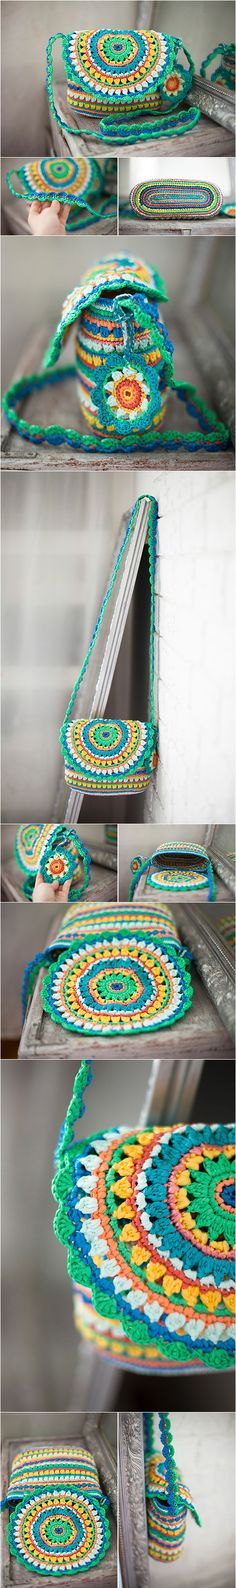 Mandala Bag, Rainbow Purse, Plarn Colorful Satchle, Ecofriendly Green Yellow Handbag, Gypsy Style Bag, Boho Crochet Tote, Summer Cross Body Bag, #frombabushkabag, upcycling, recycling, upcycled bag